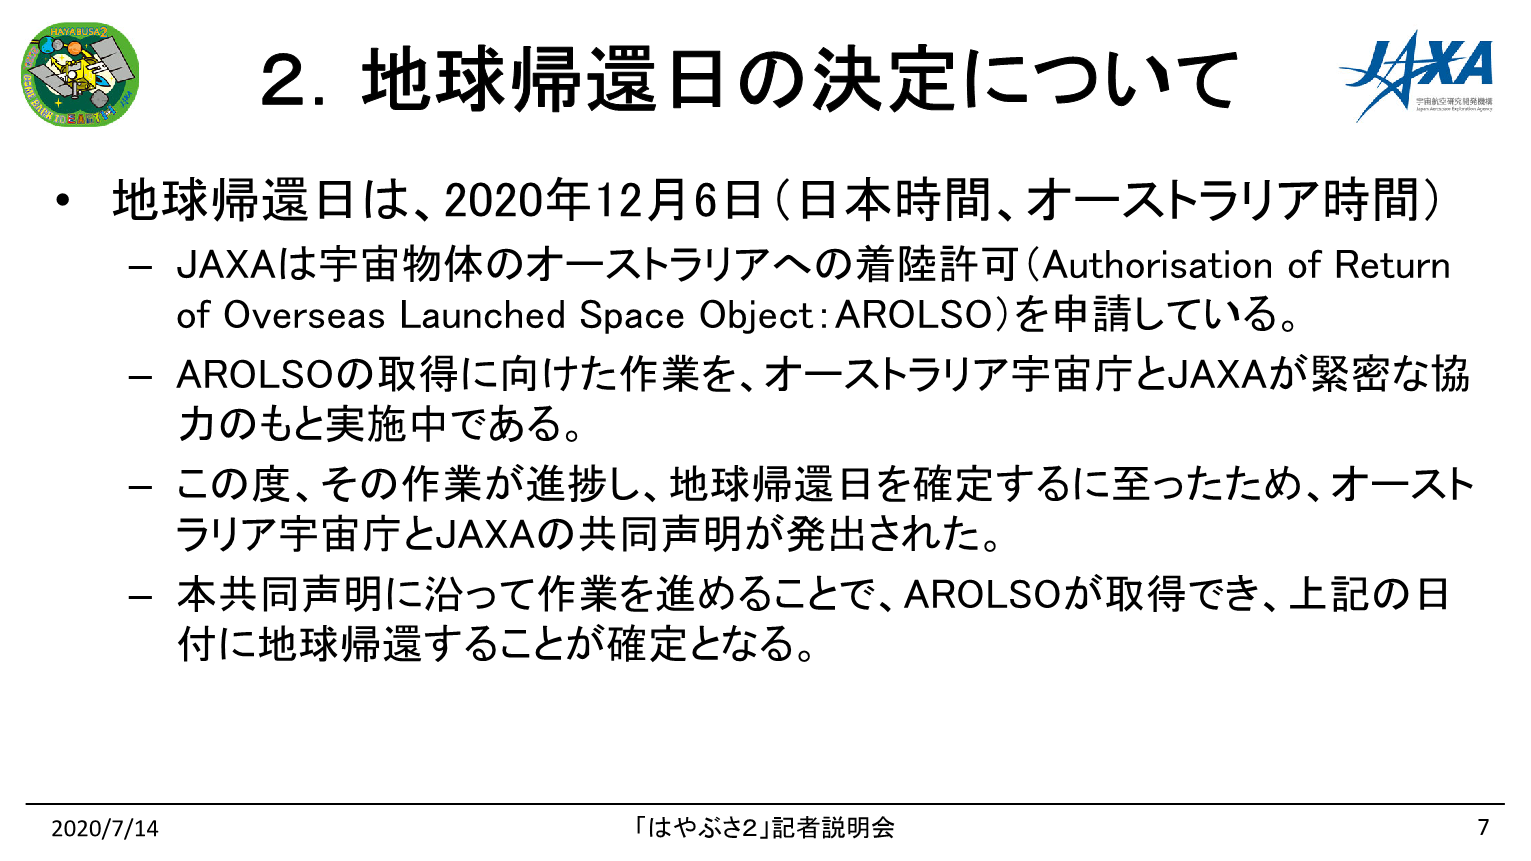 f:id:Imamura:20200714230244p:plain